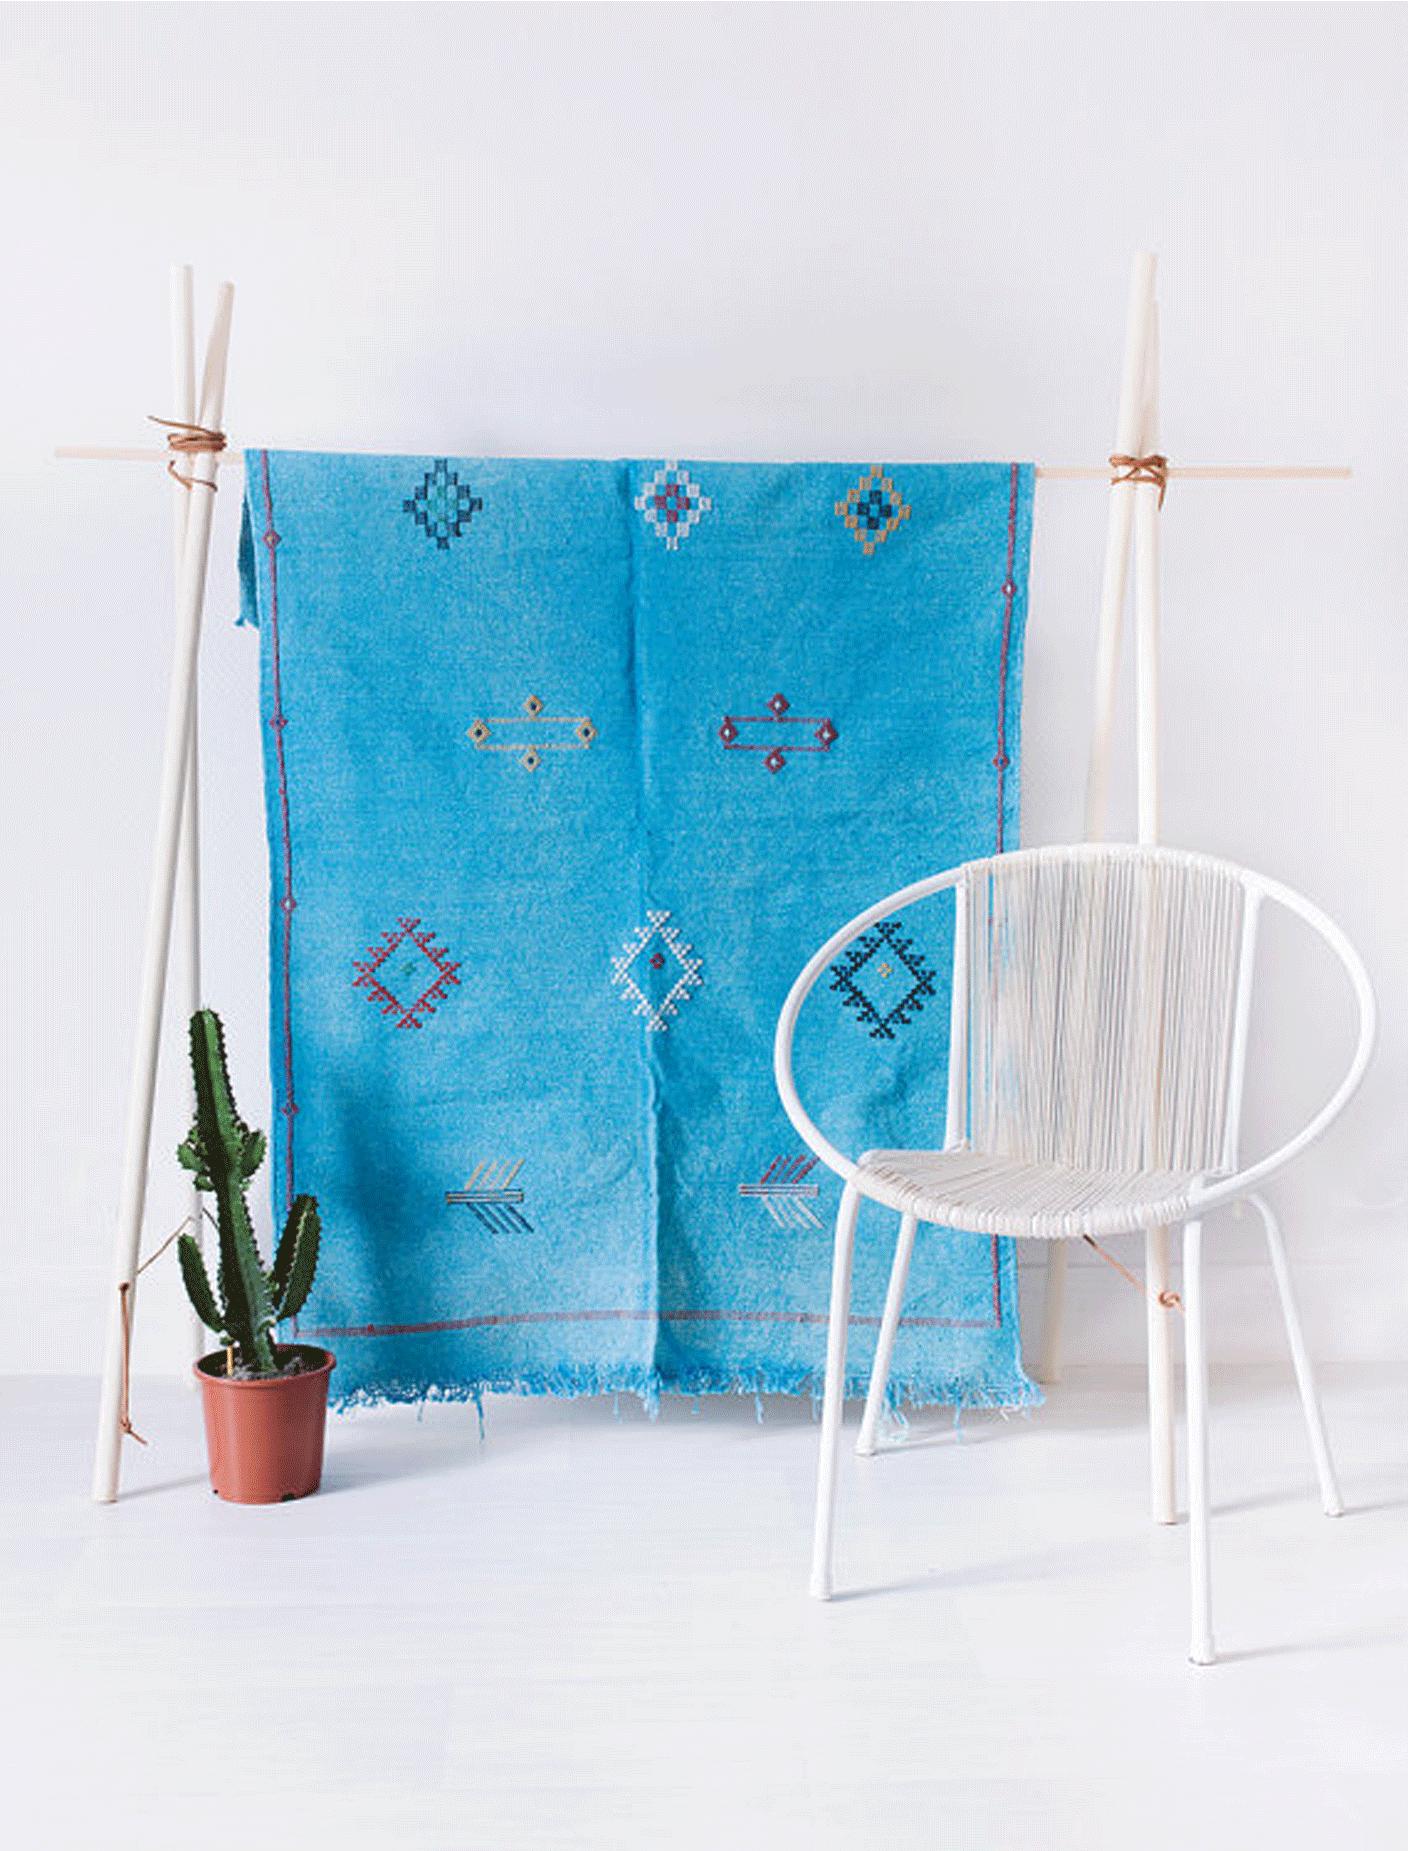 moroccan rugs | @themissprints